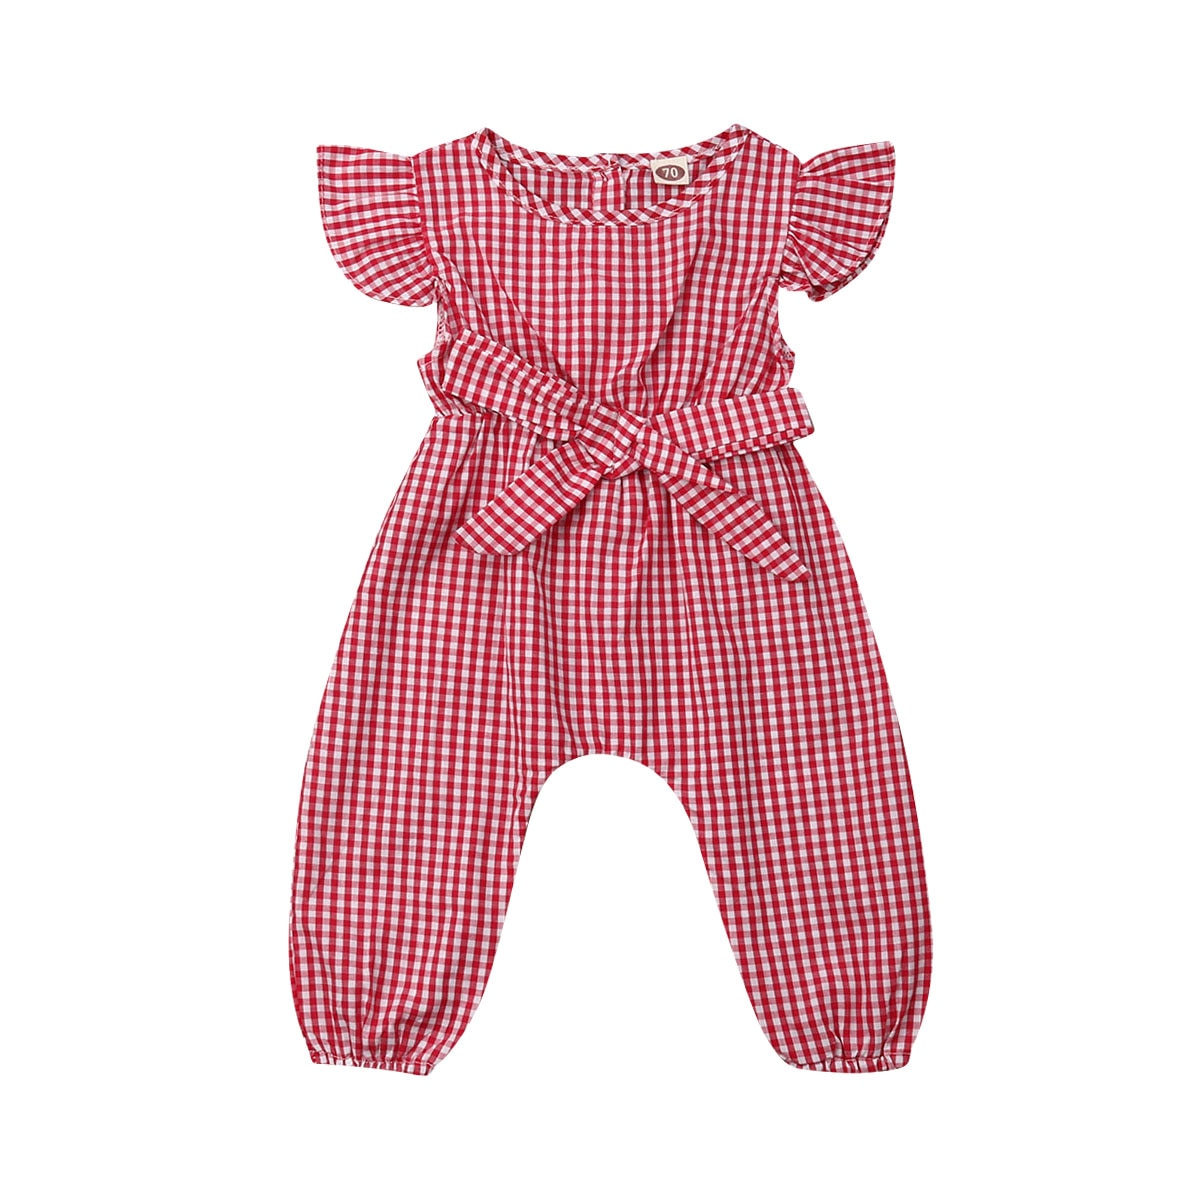 Ropa de niño niña verano bebé recién nacido traje para niñas mono ropa atuendo mono